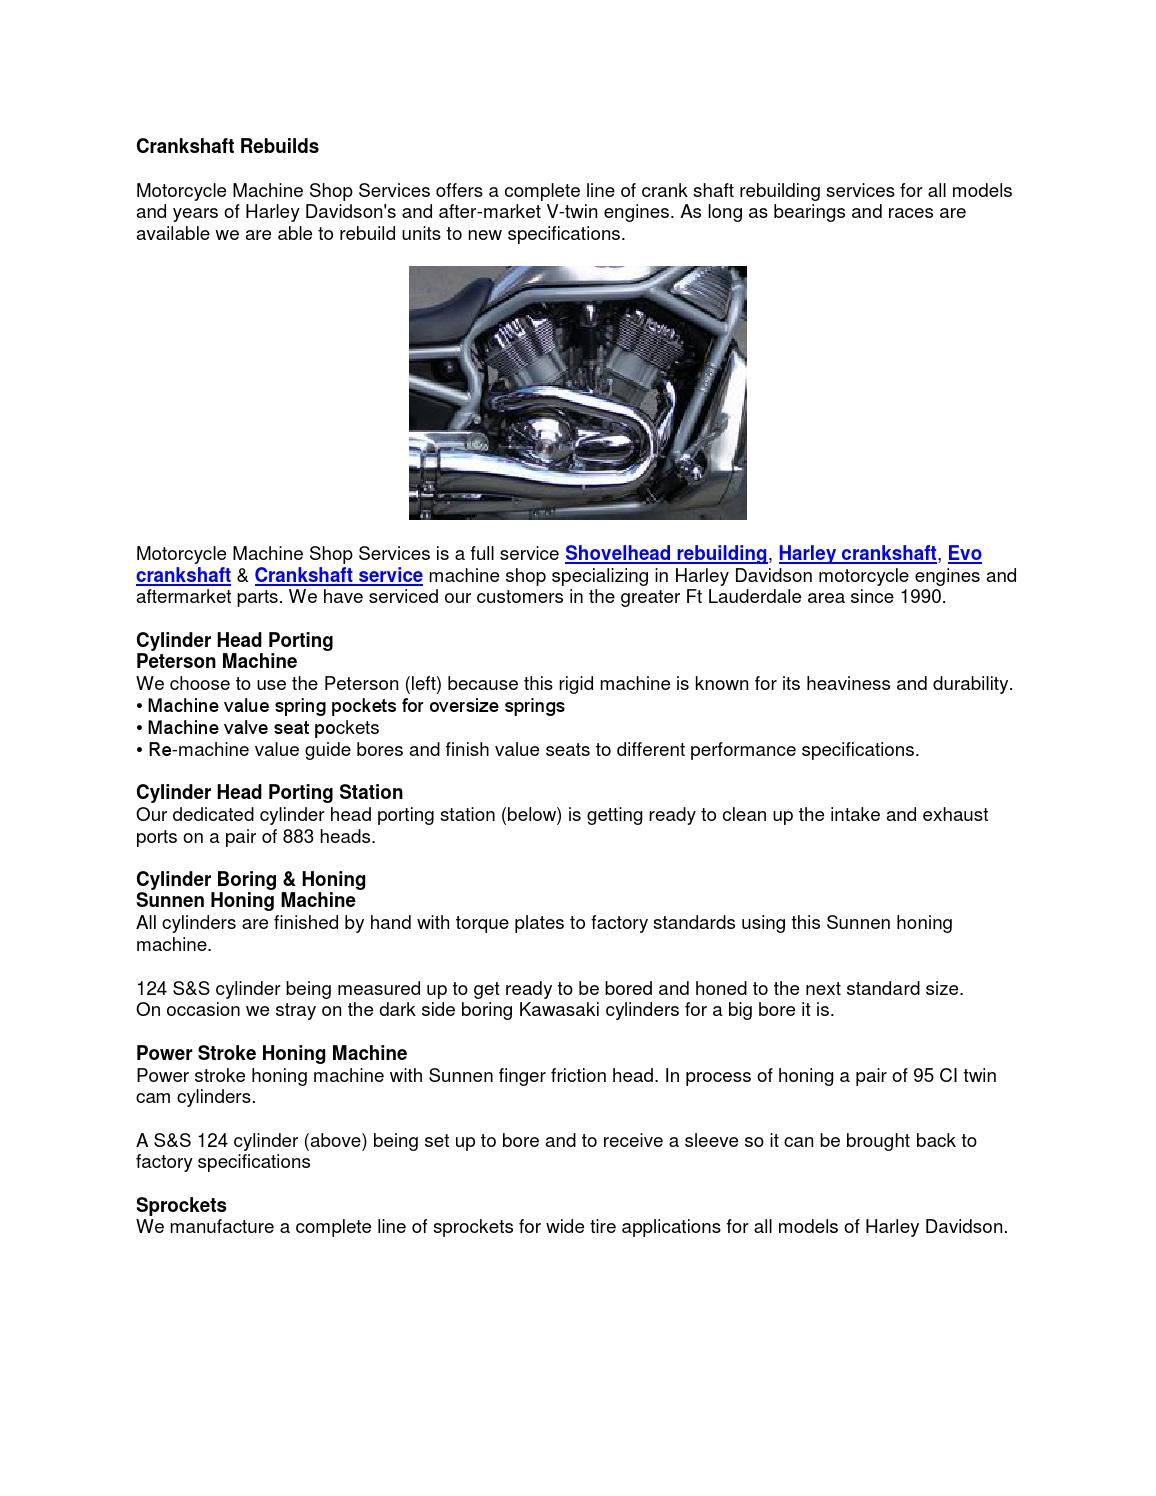 Crankshaft rebuilds by Motorcycle machine shop - issuu